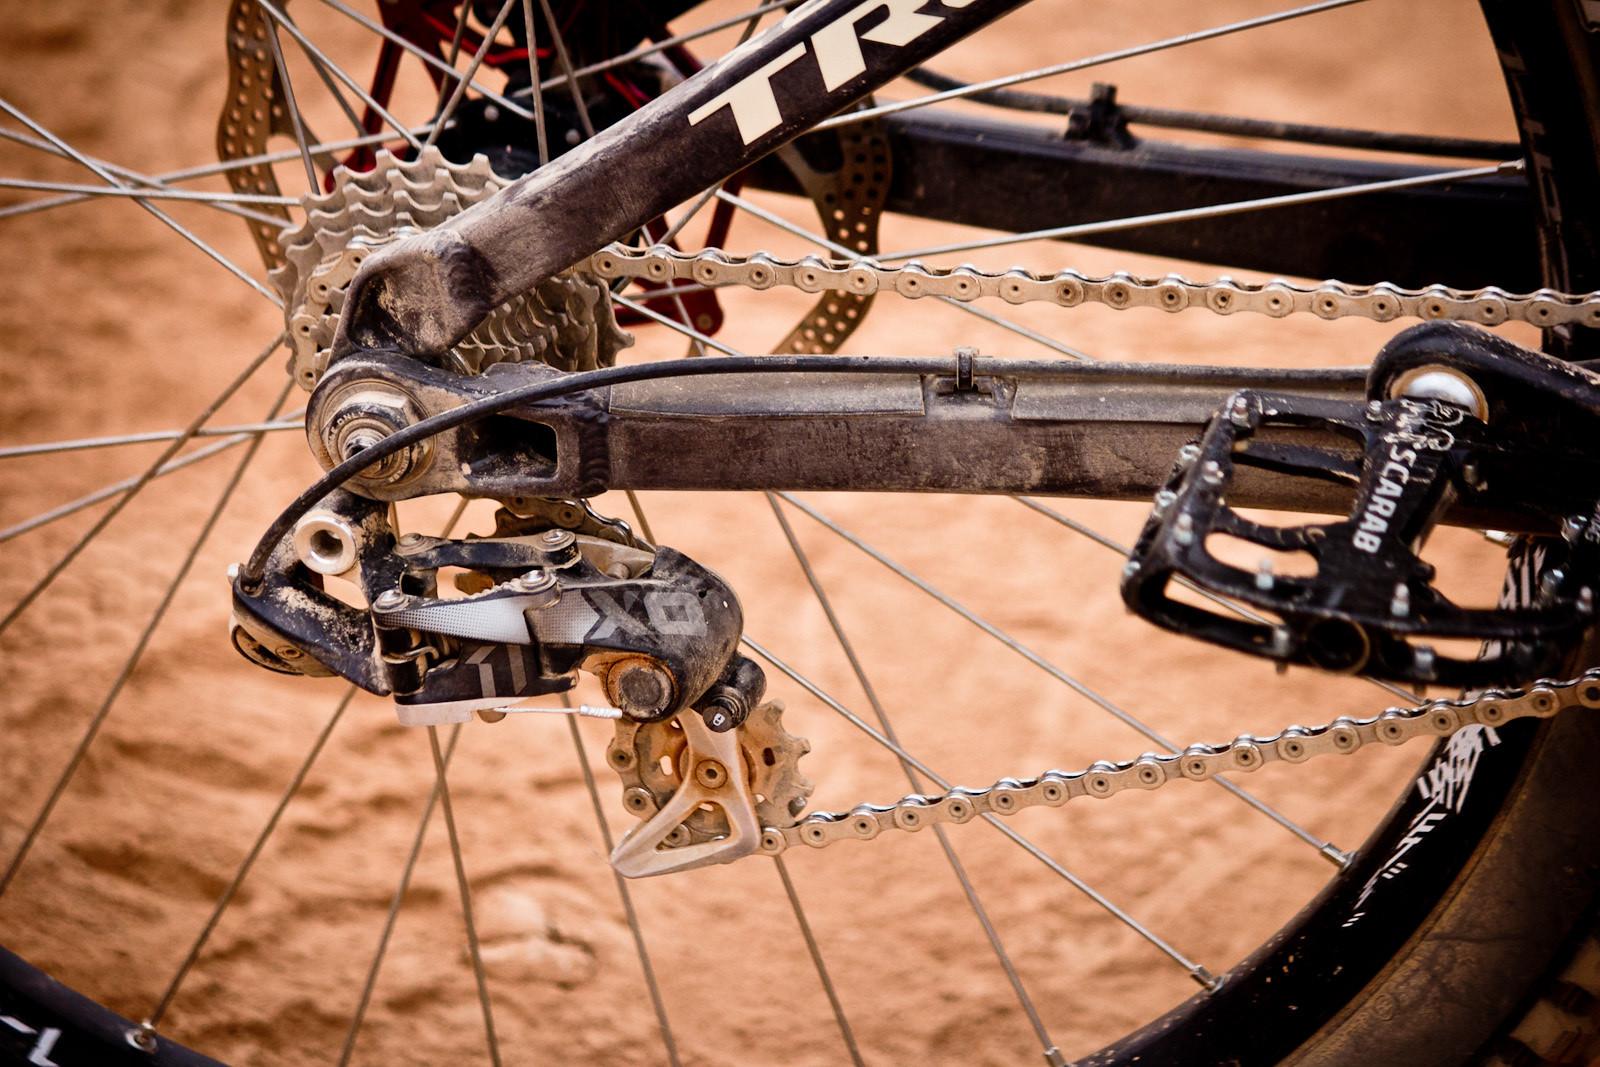 8b4c9659b67 Semenuk's Trek Session Park for Rampage 2013 - Rampage Pro Bike: Brandon  Semenuk's Trek Session Park - Mountain Biking Pictures - Vital MTB